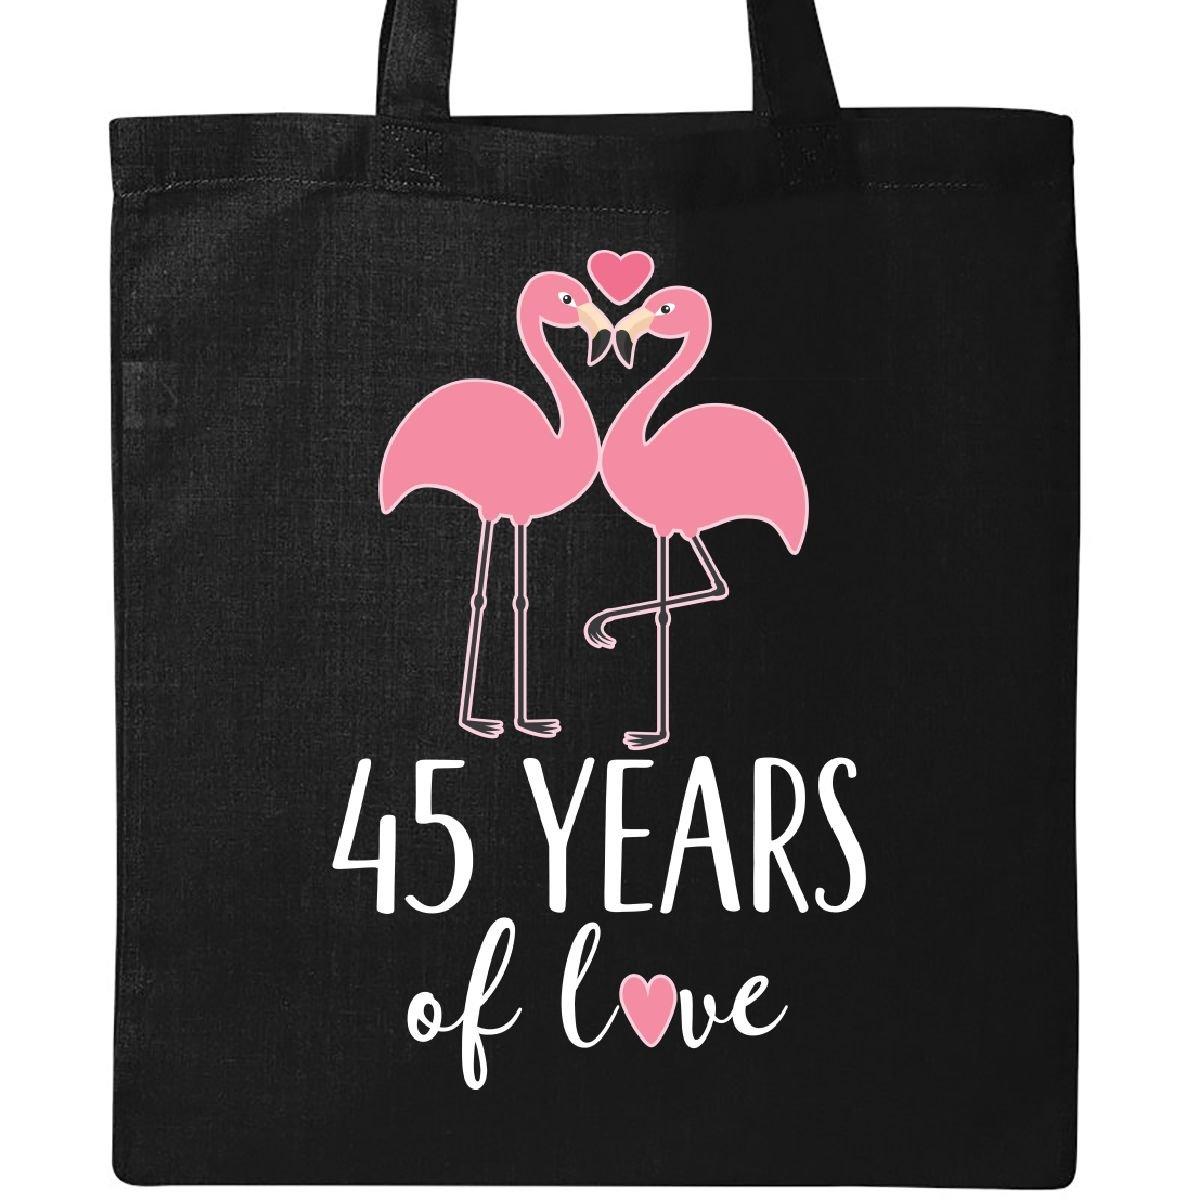 Inktastic 45th Wedding Anniversary Gift Tote Bag Black